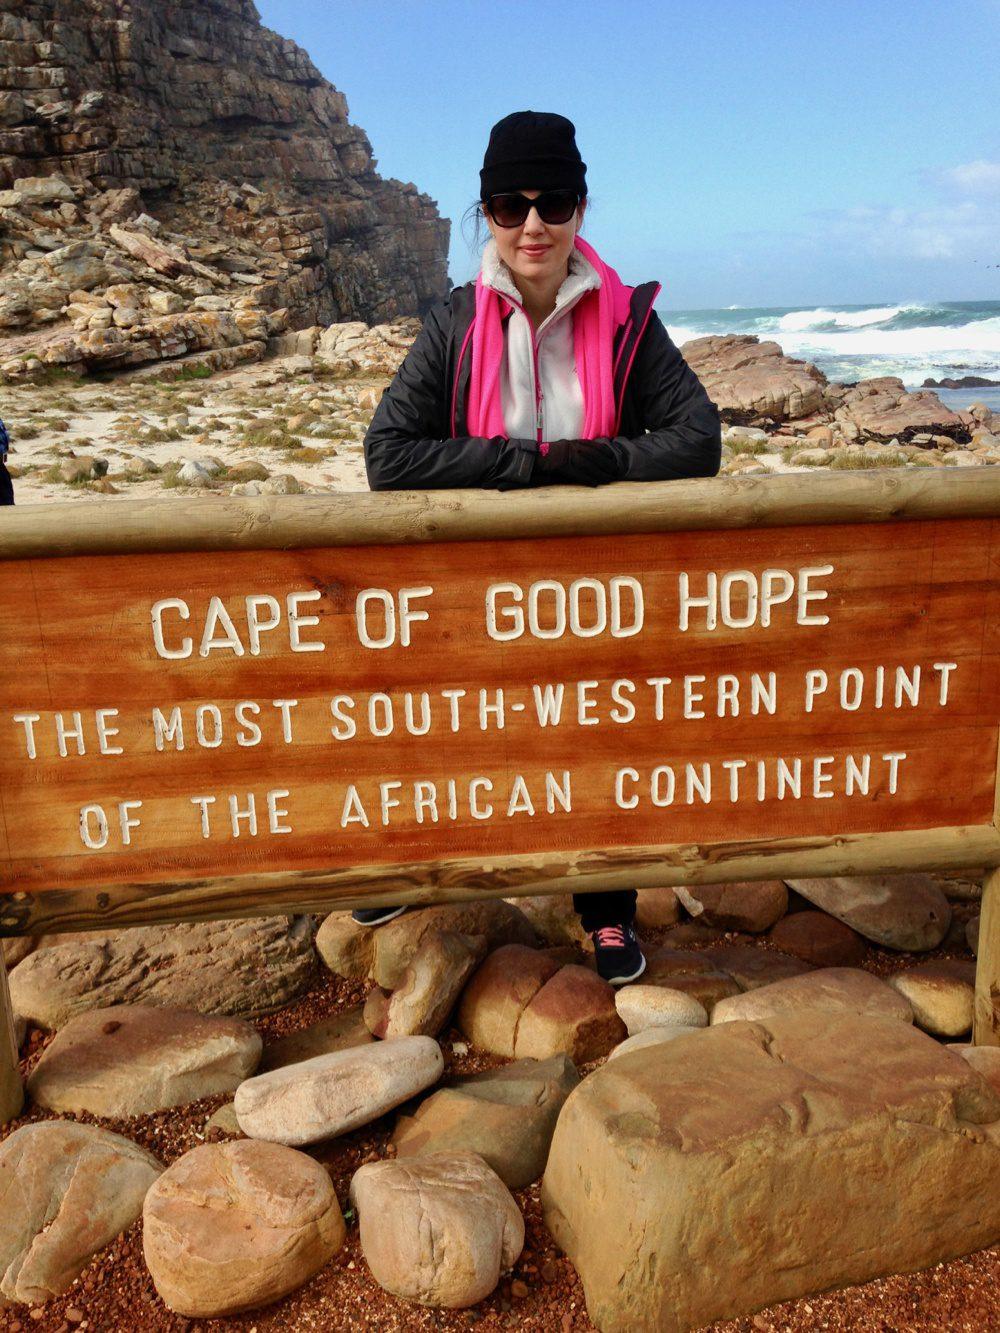 Teacher Appreciation ideas: Cape of Good Hope sign